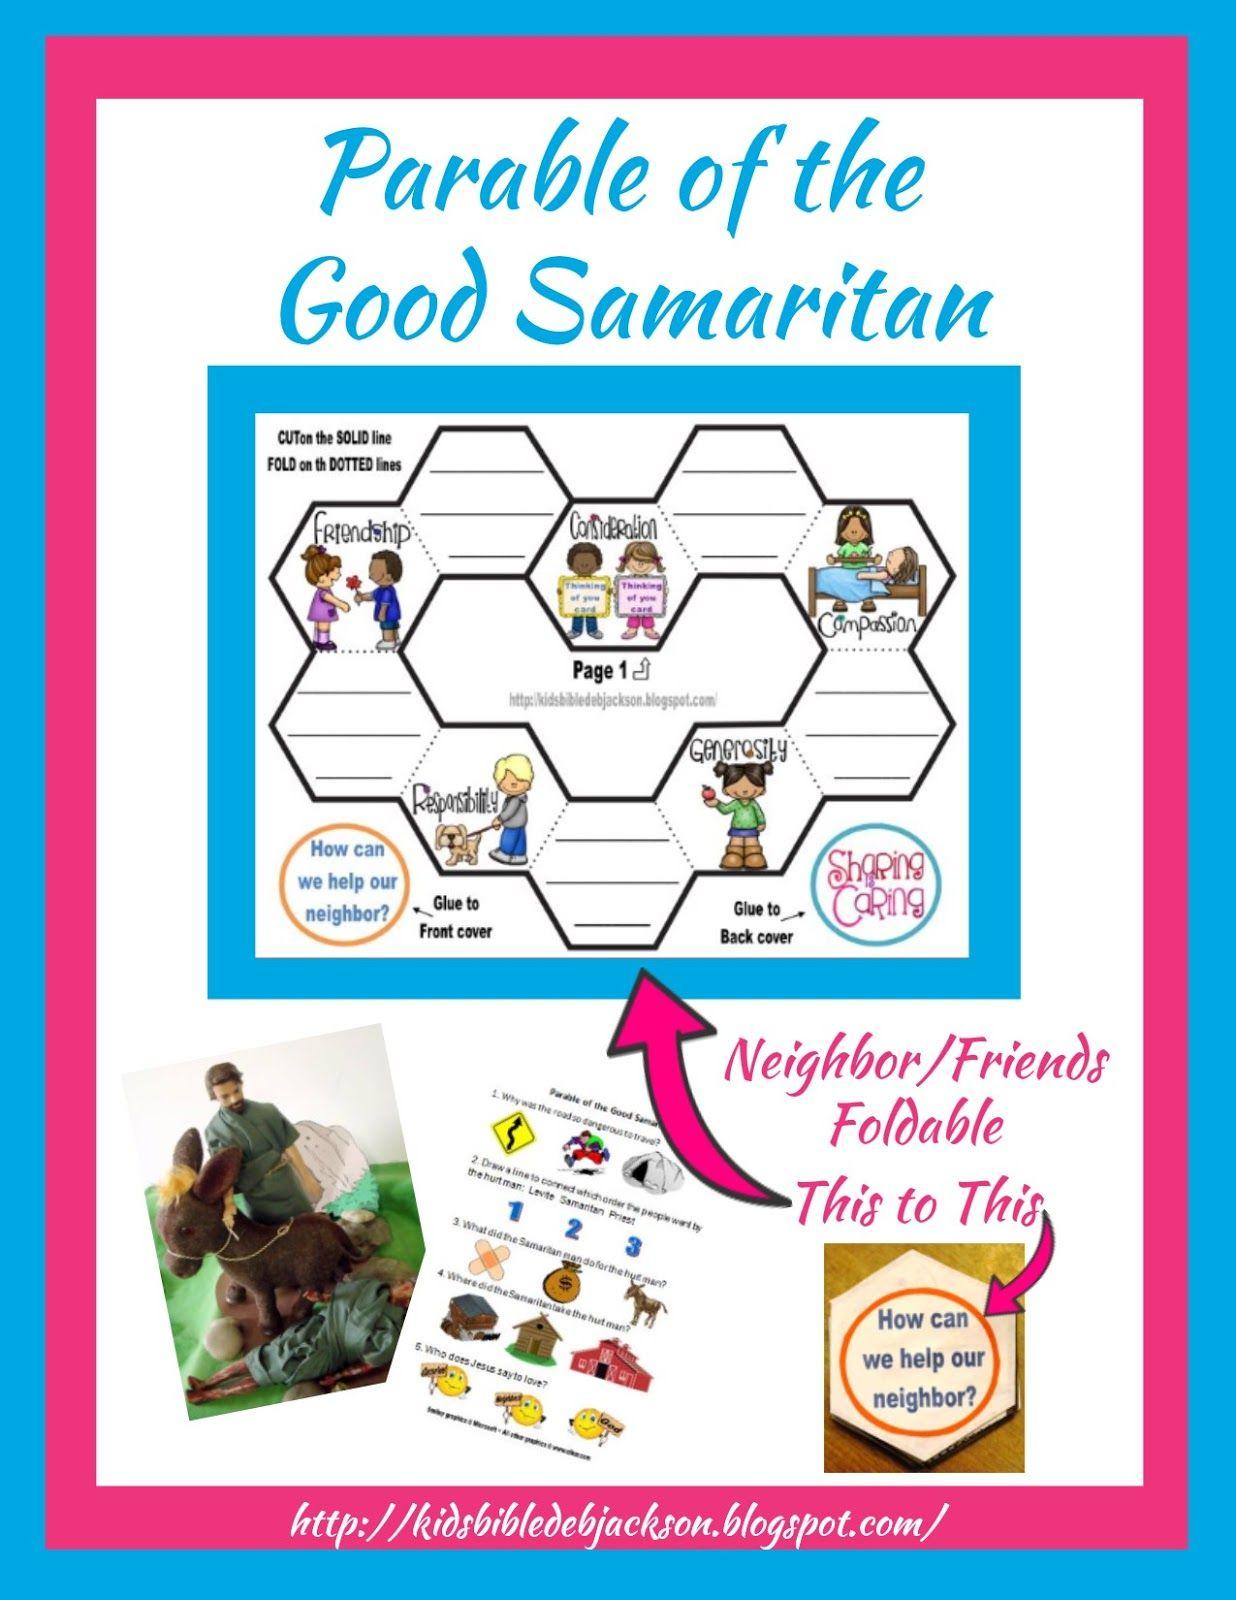 Good samaritan sunday school craft - Childrens Sunday School Crafts Bible Fun For Kids Parable Of The Good Samaritan Download